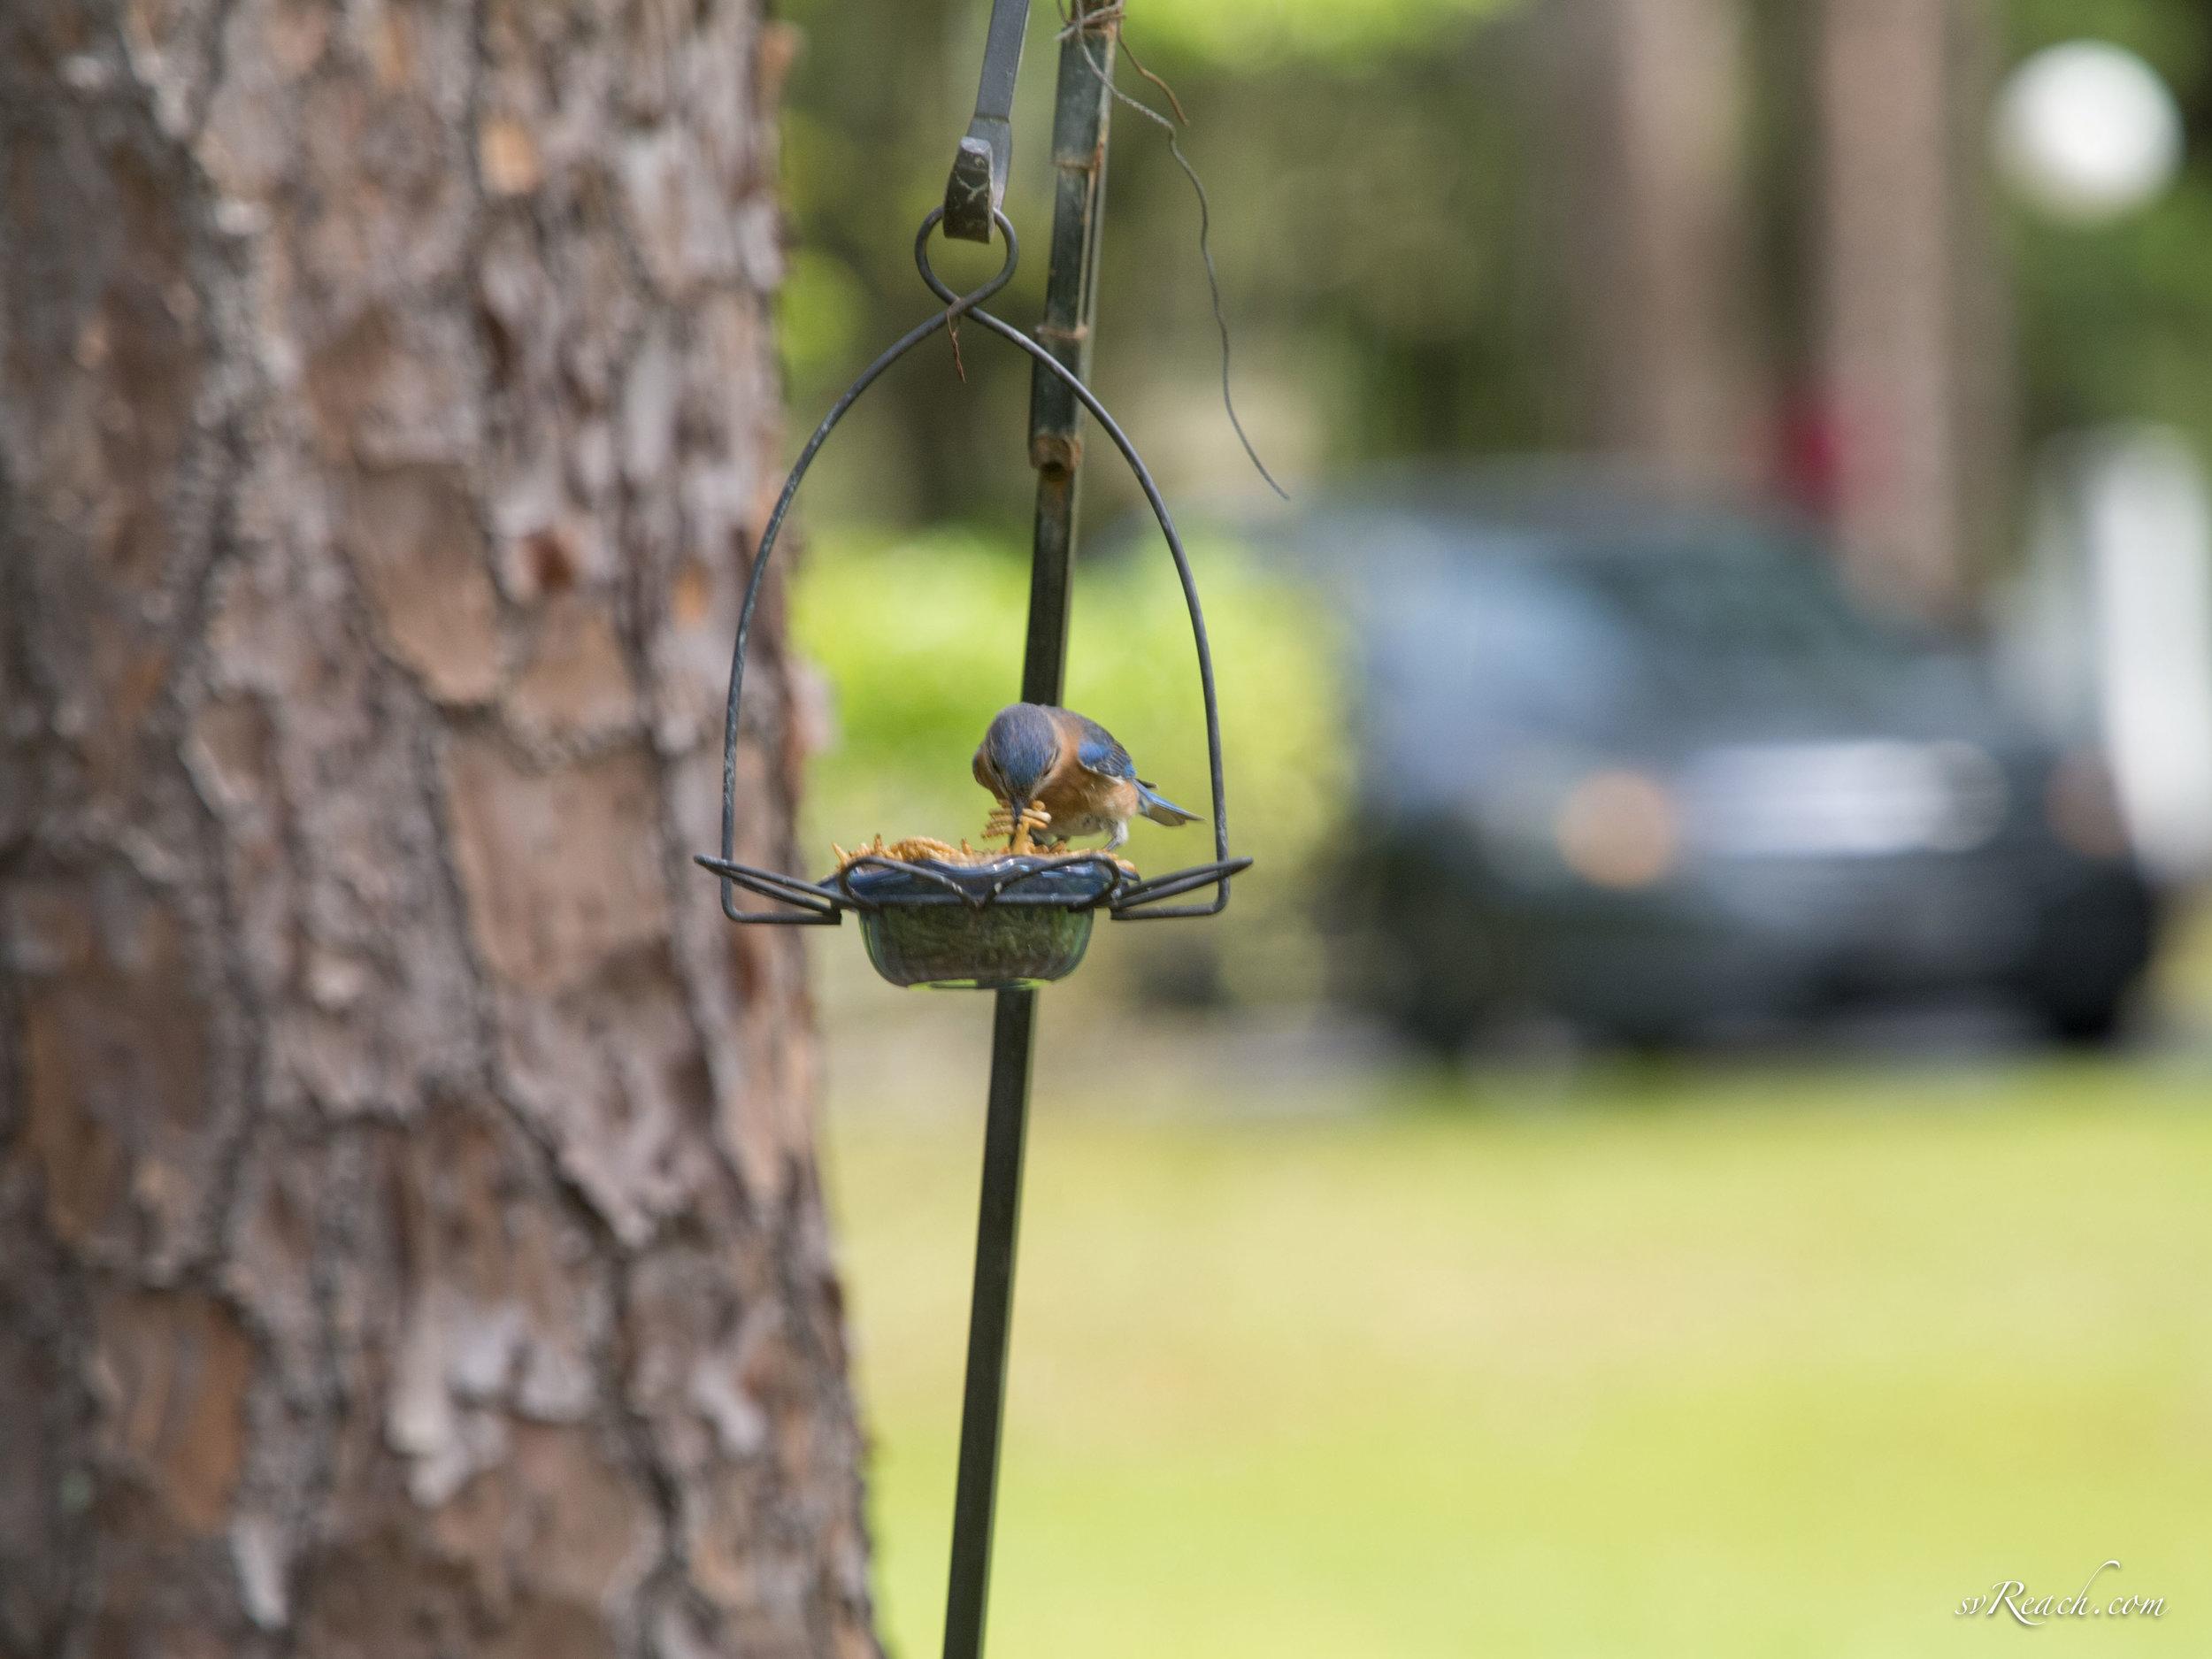 Juvenile eastern bluebird eating worms